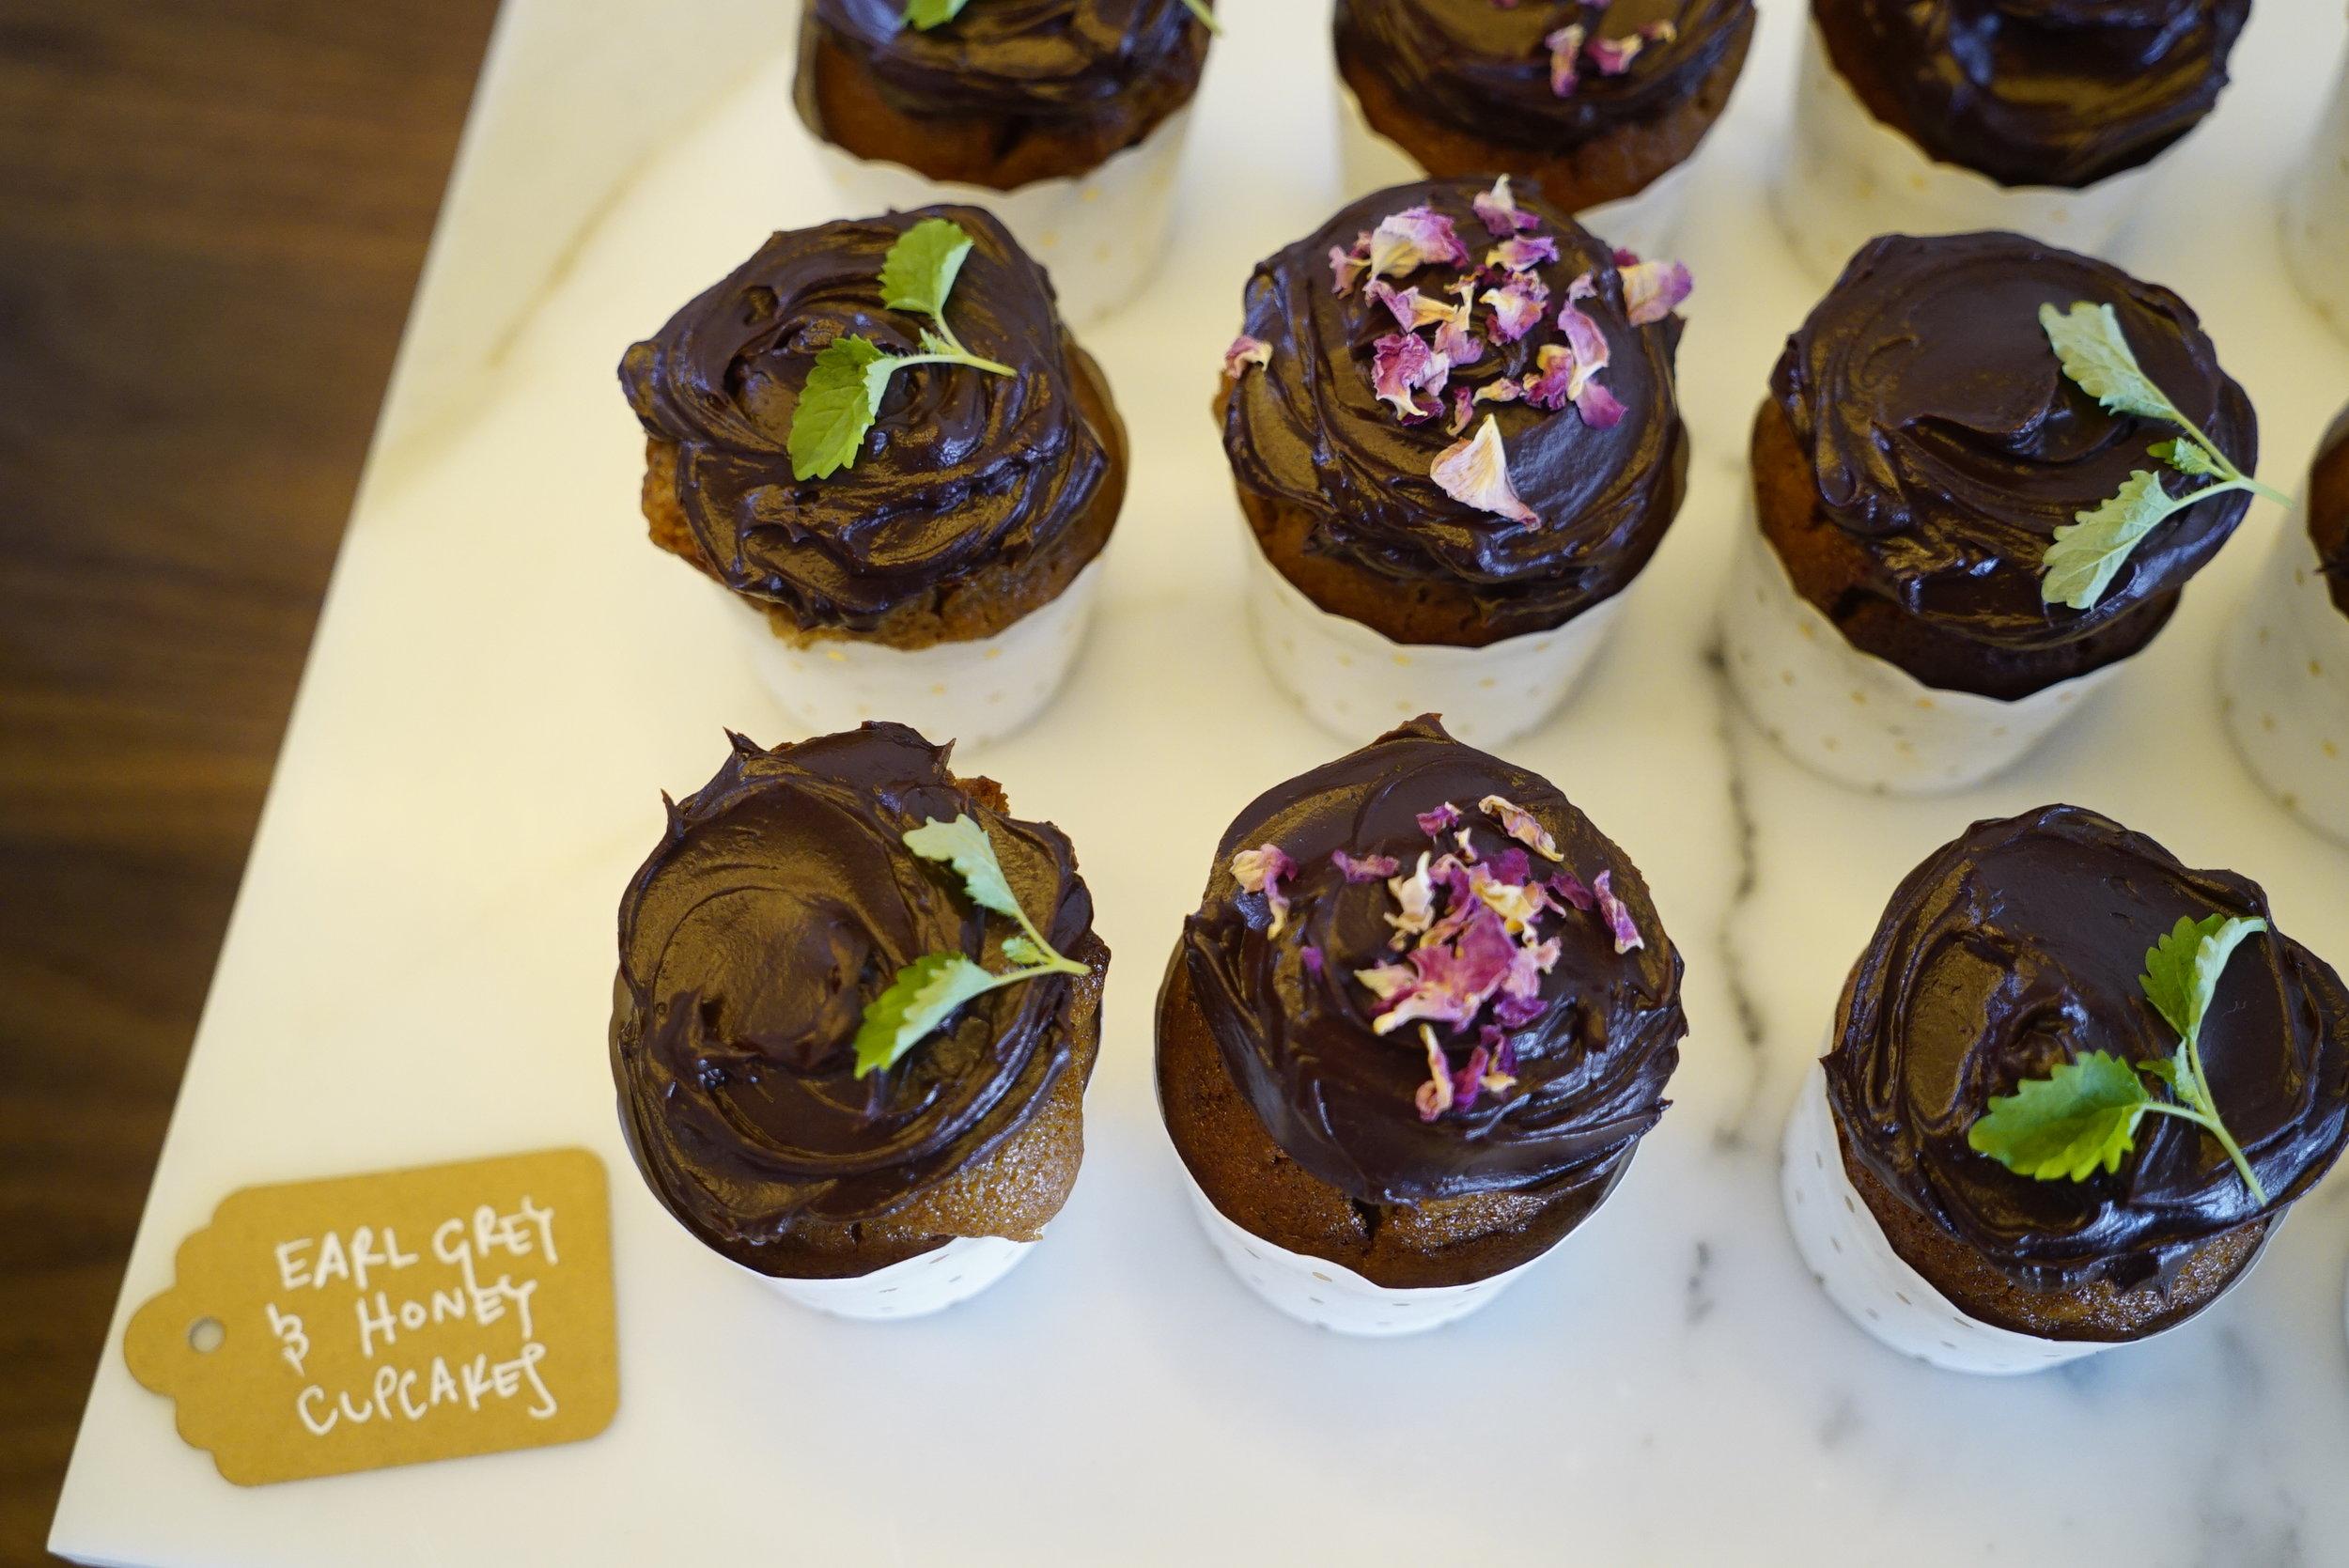 earl grey and honey cupcakes.JPG